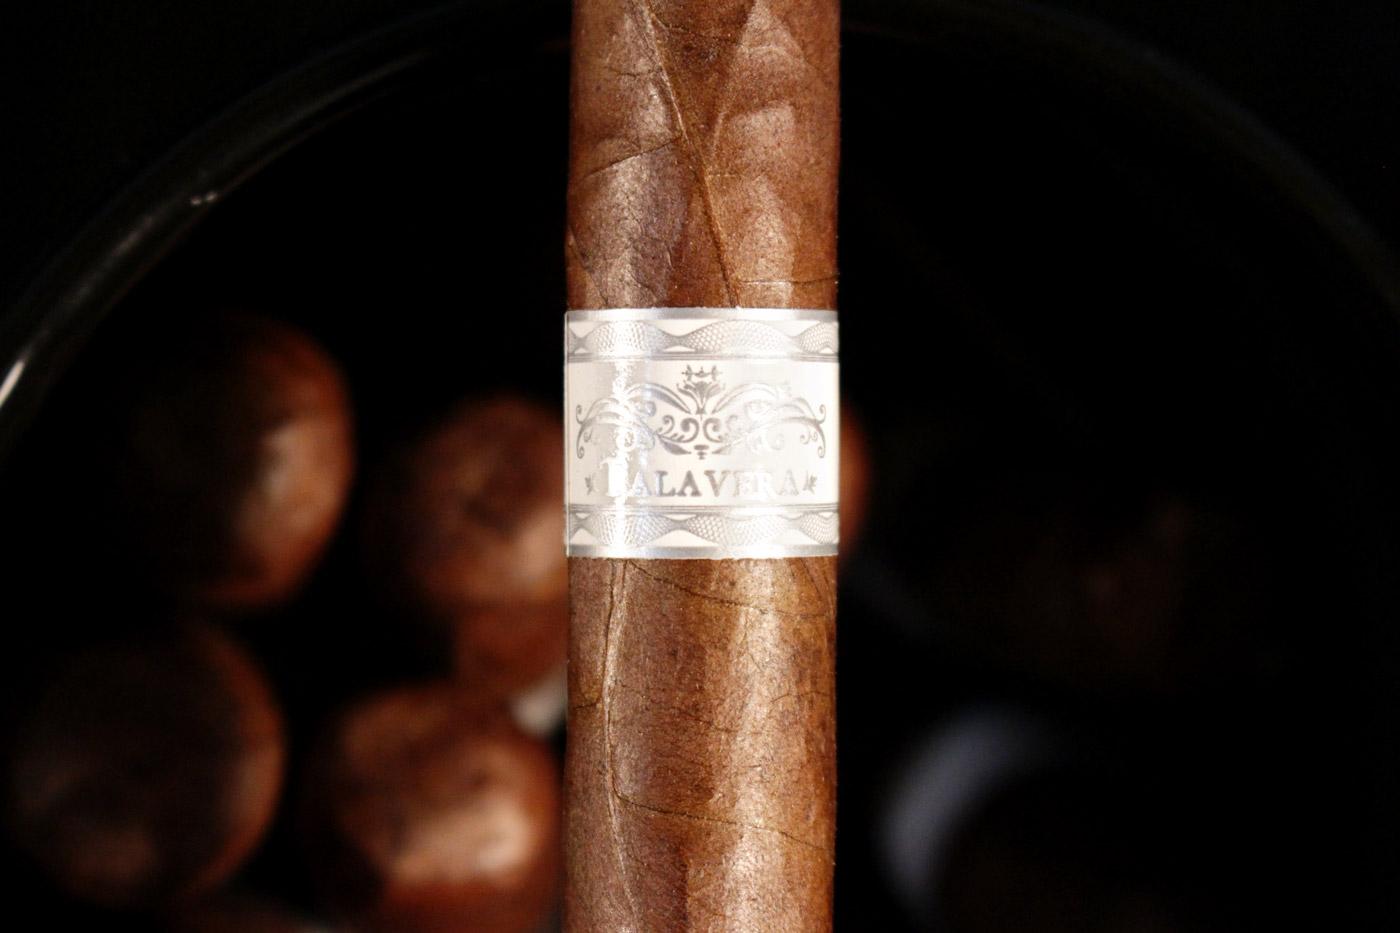 Talavera Edición Exclusiva 2015 cigar review